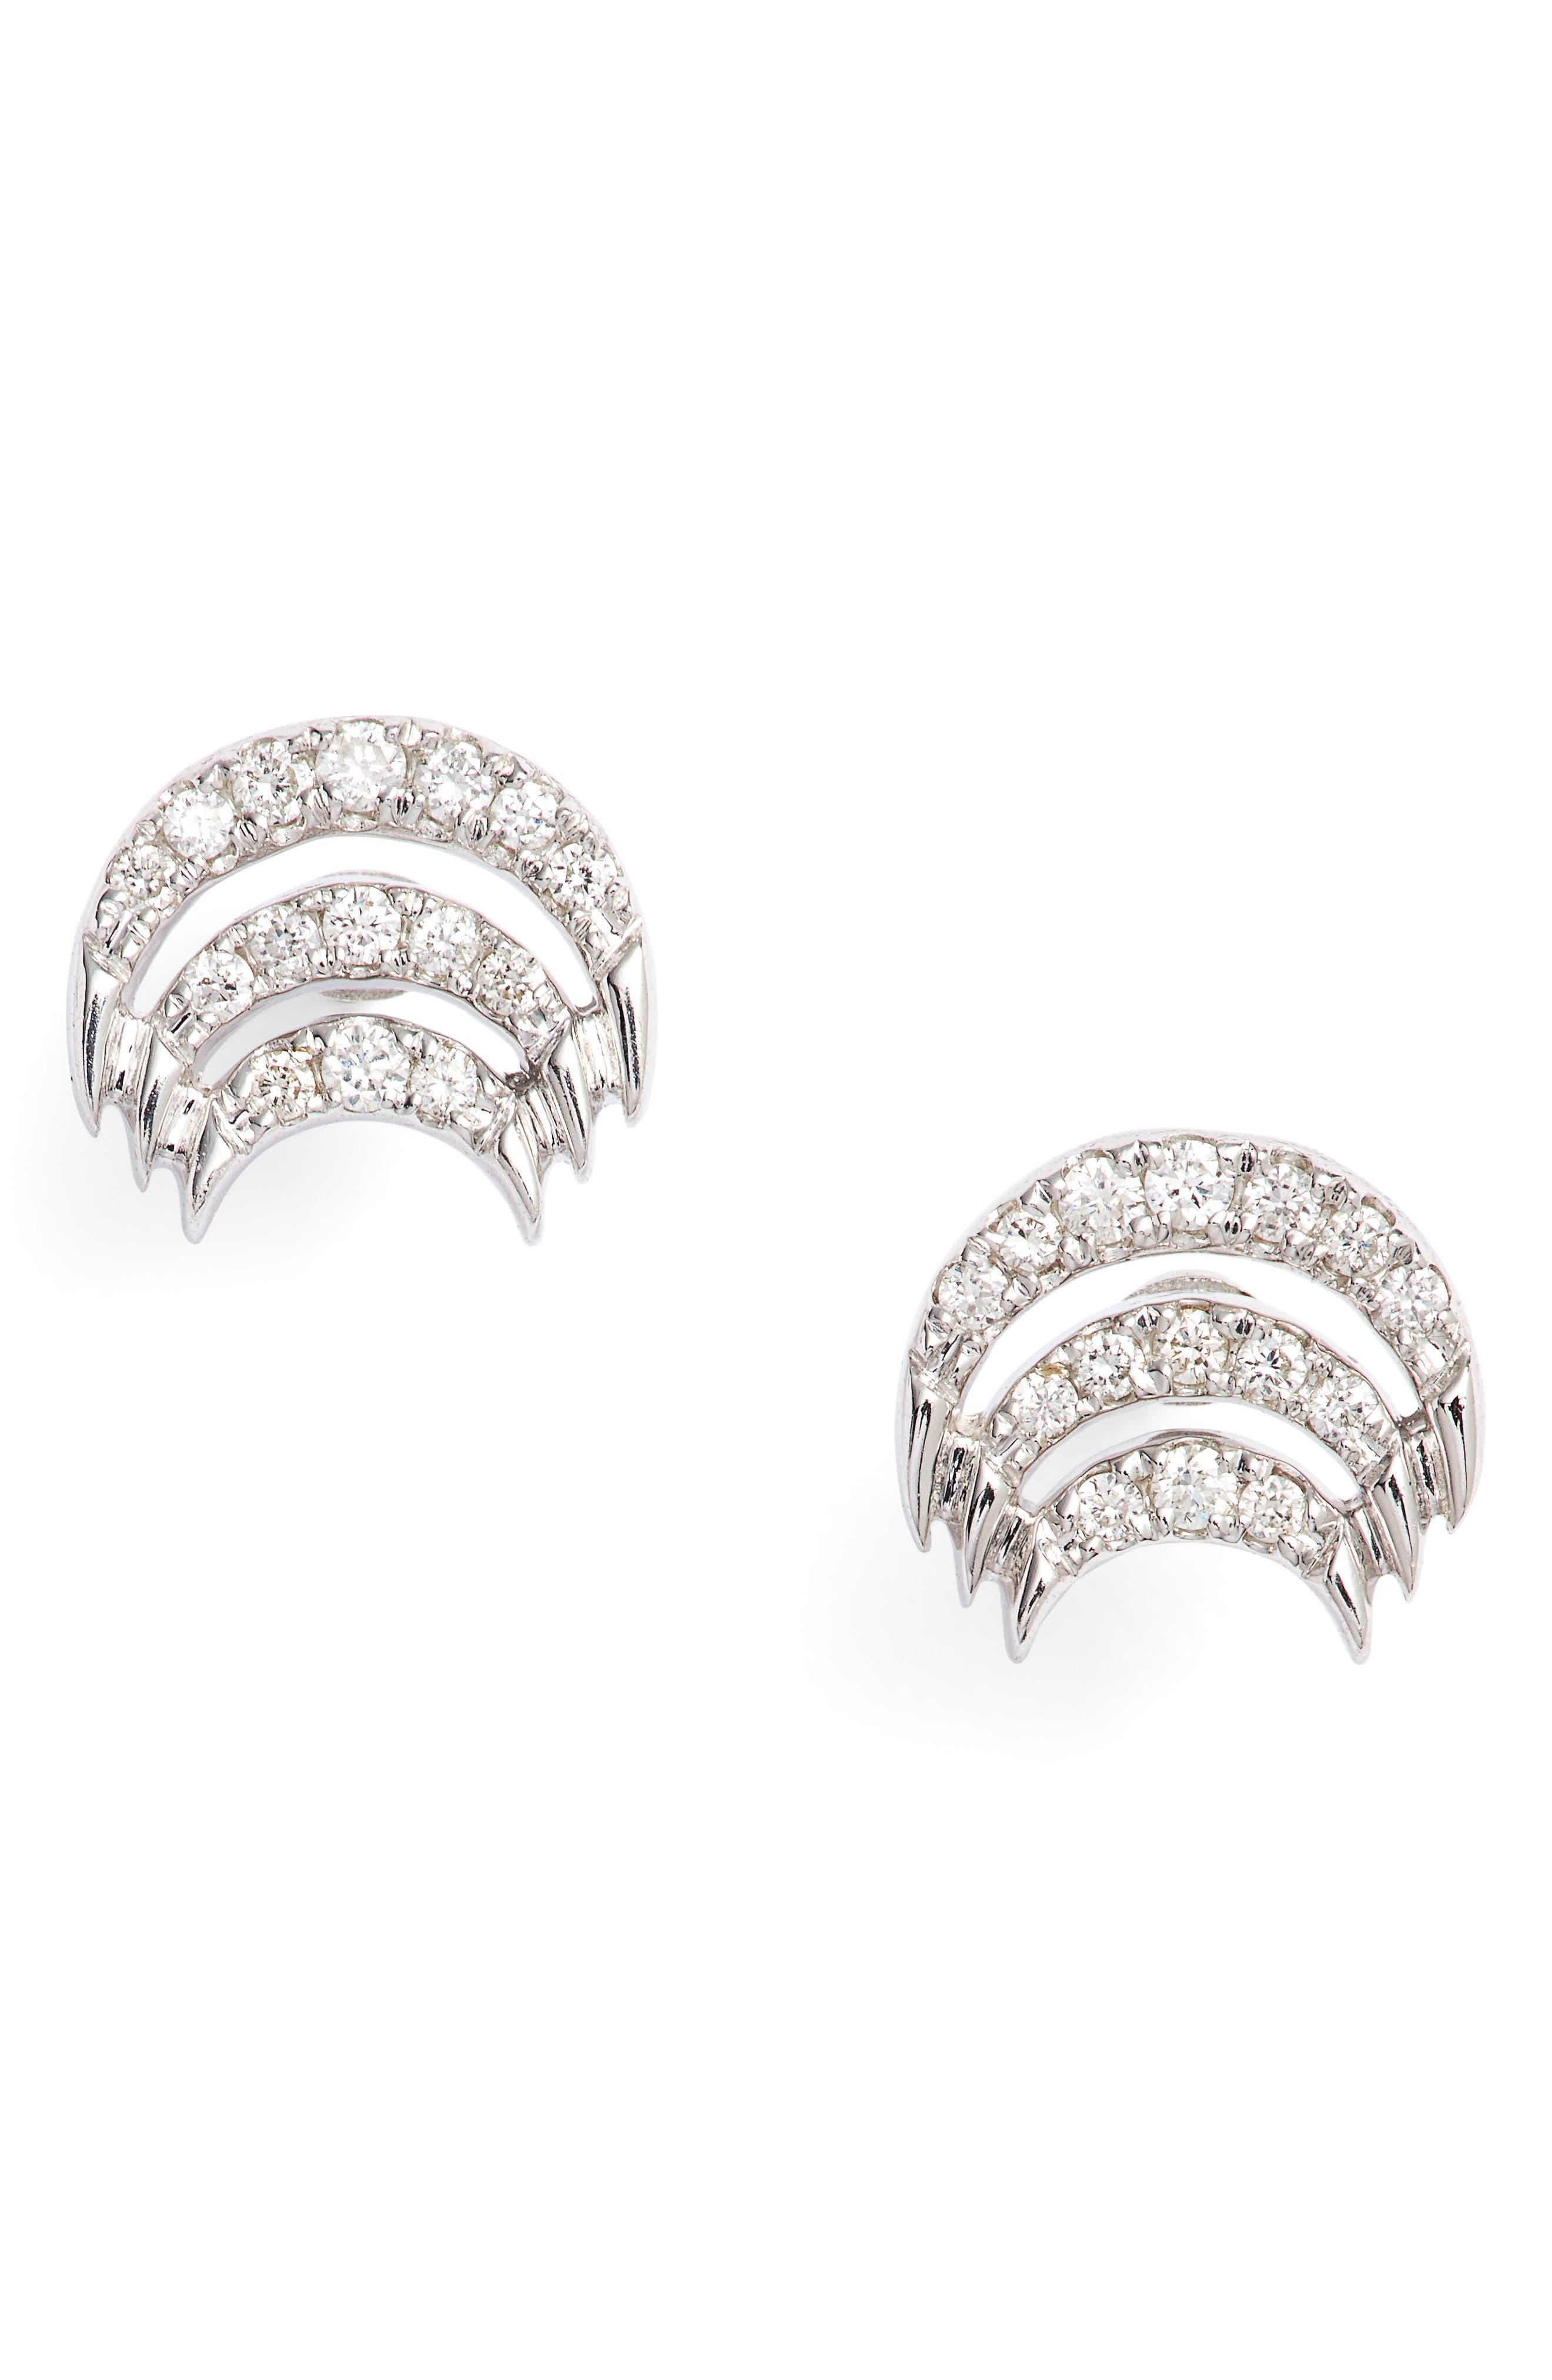 Dana Rebecca Designs Isla Rio Diamond Stud Earrings